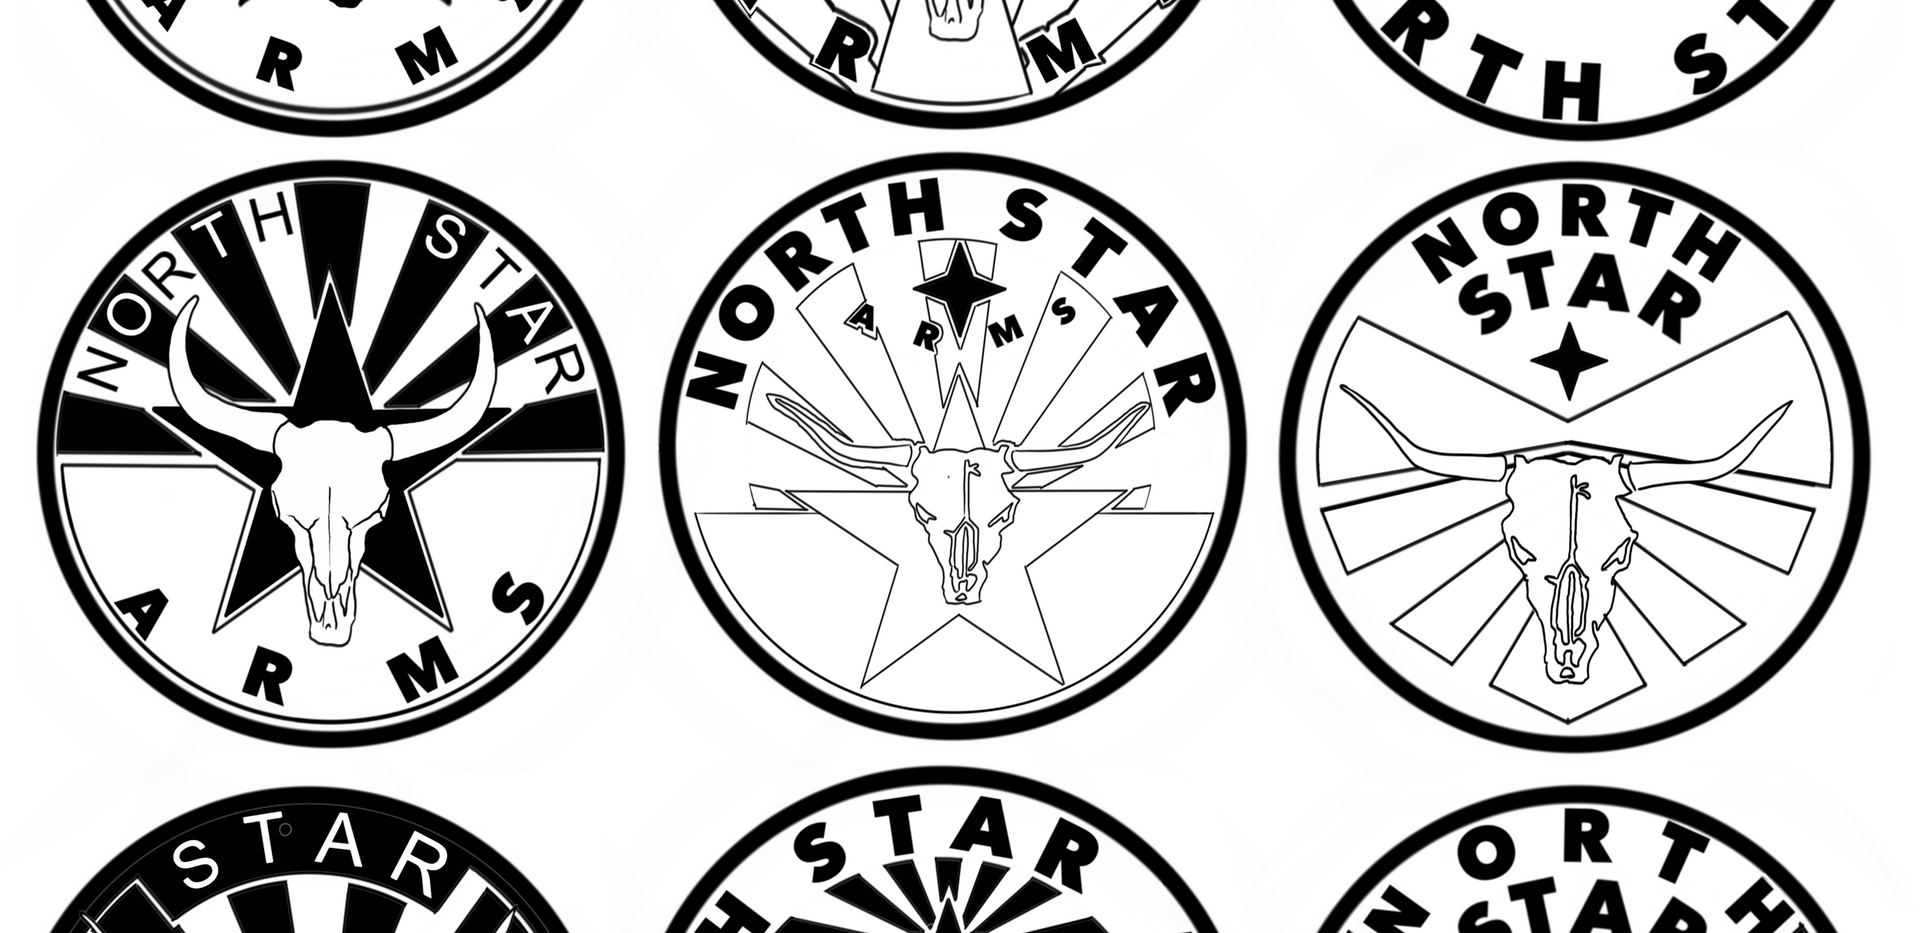 North Star Concept